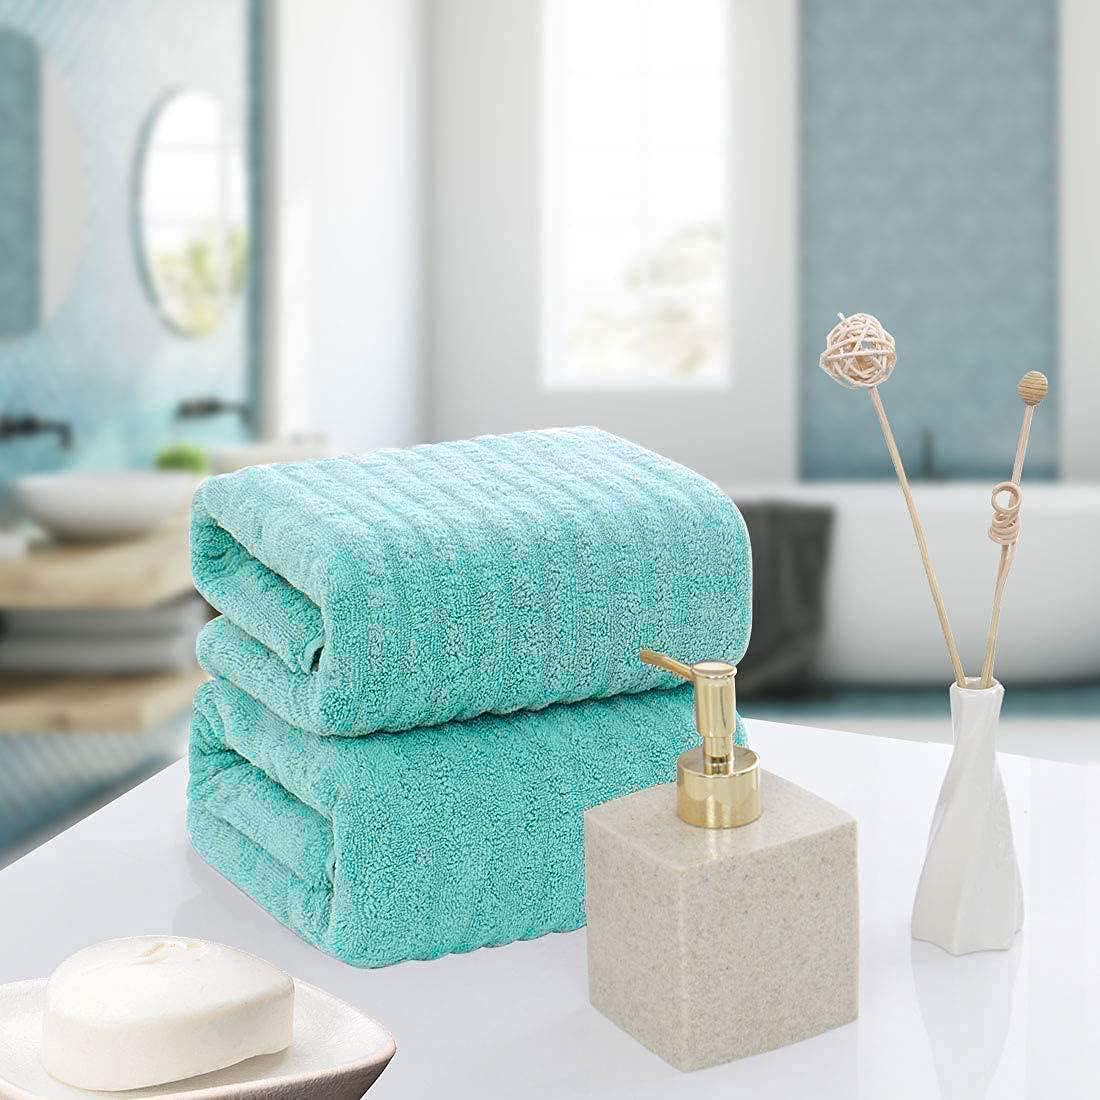 A surprise price is realized Bath Towel Sets- Set of 2- Orga Aqua Blue- Quick Towel- Super special price Dry